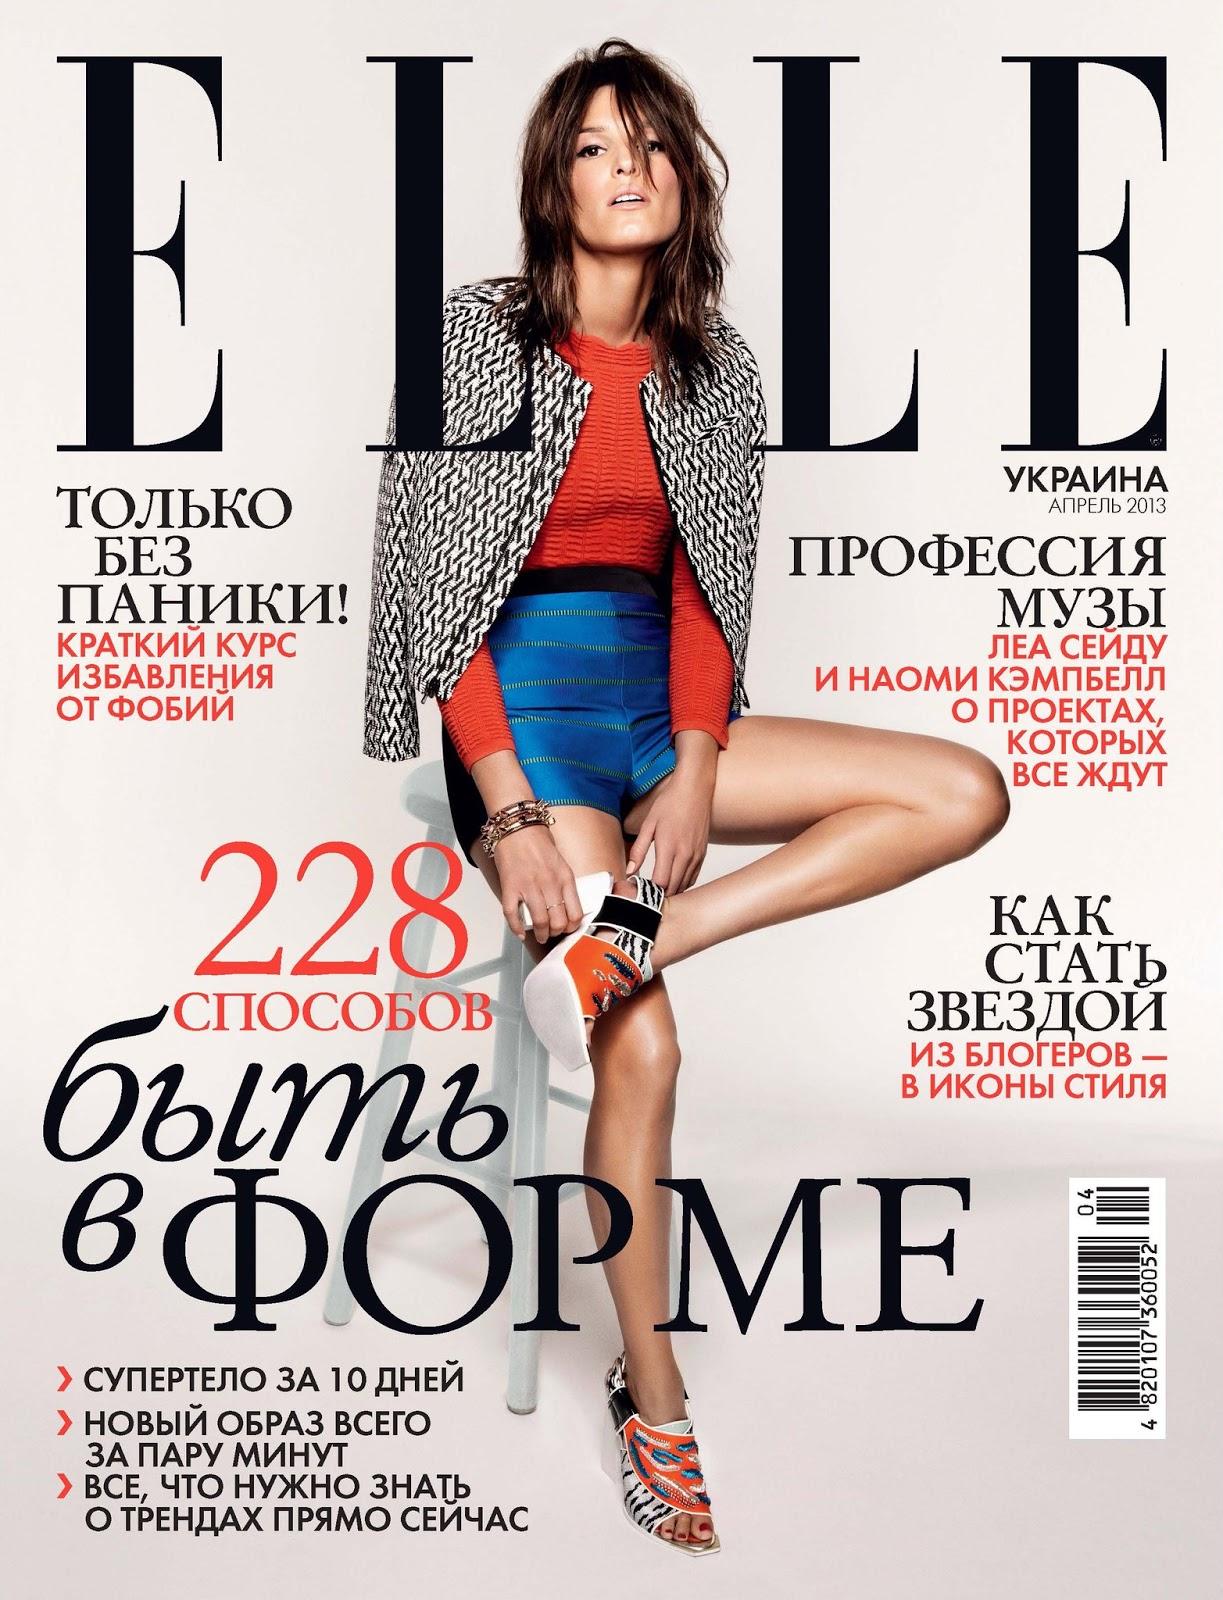 http://1.bp.blogspot.com/-41jpZ7bhJLE/UVLakq-jwzI/AAAAAAABOuM/Gsk6dm9UT0k/s1600/Elle-Ukraine-April-2013-Hanneli-Mustaparta-Magazine-Cover.jpg